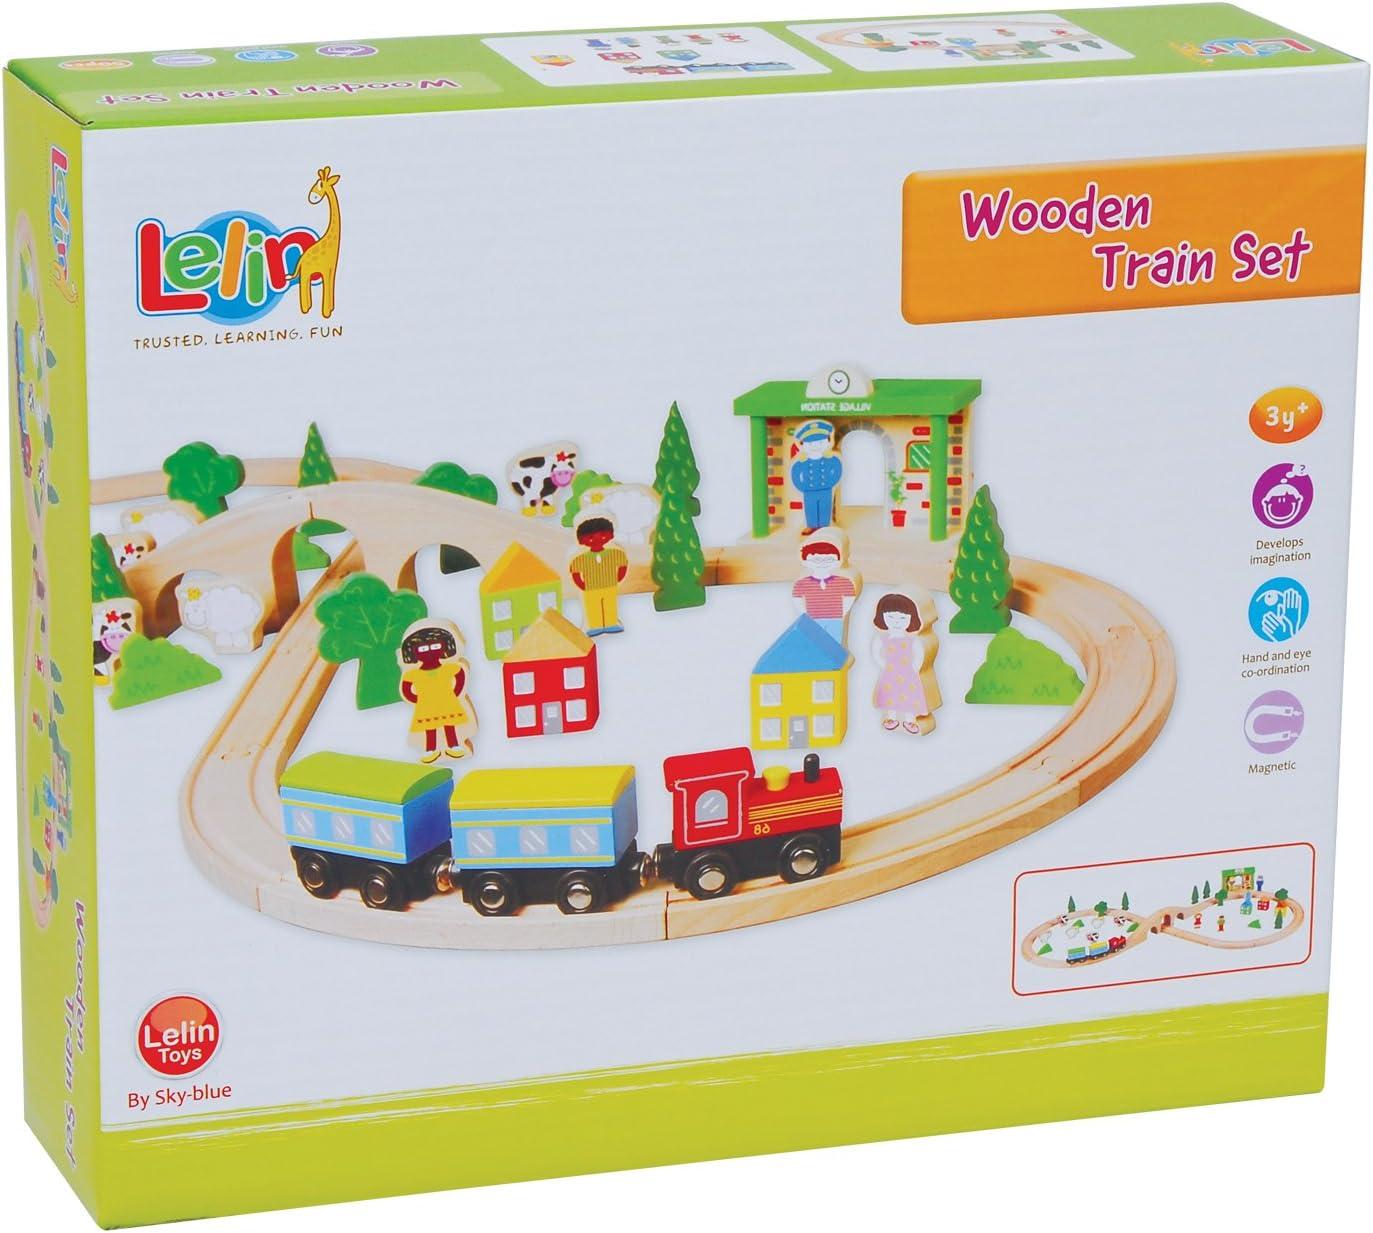 Lelin Toys 31916 Wooden Train Set